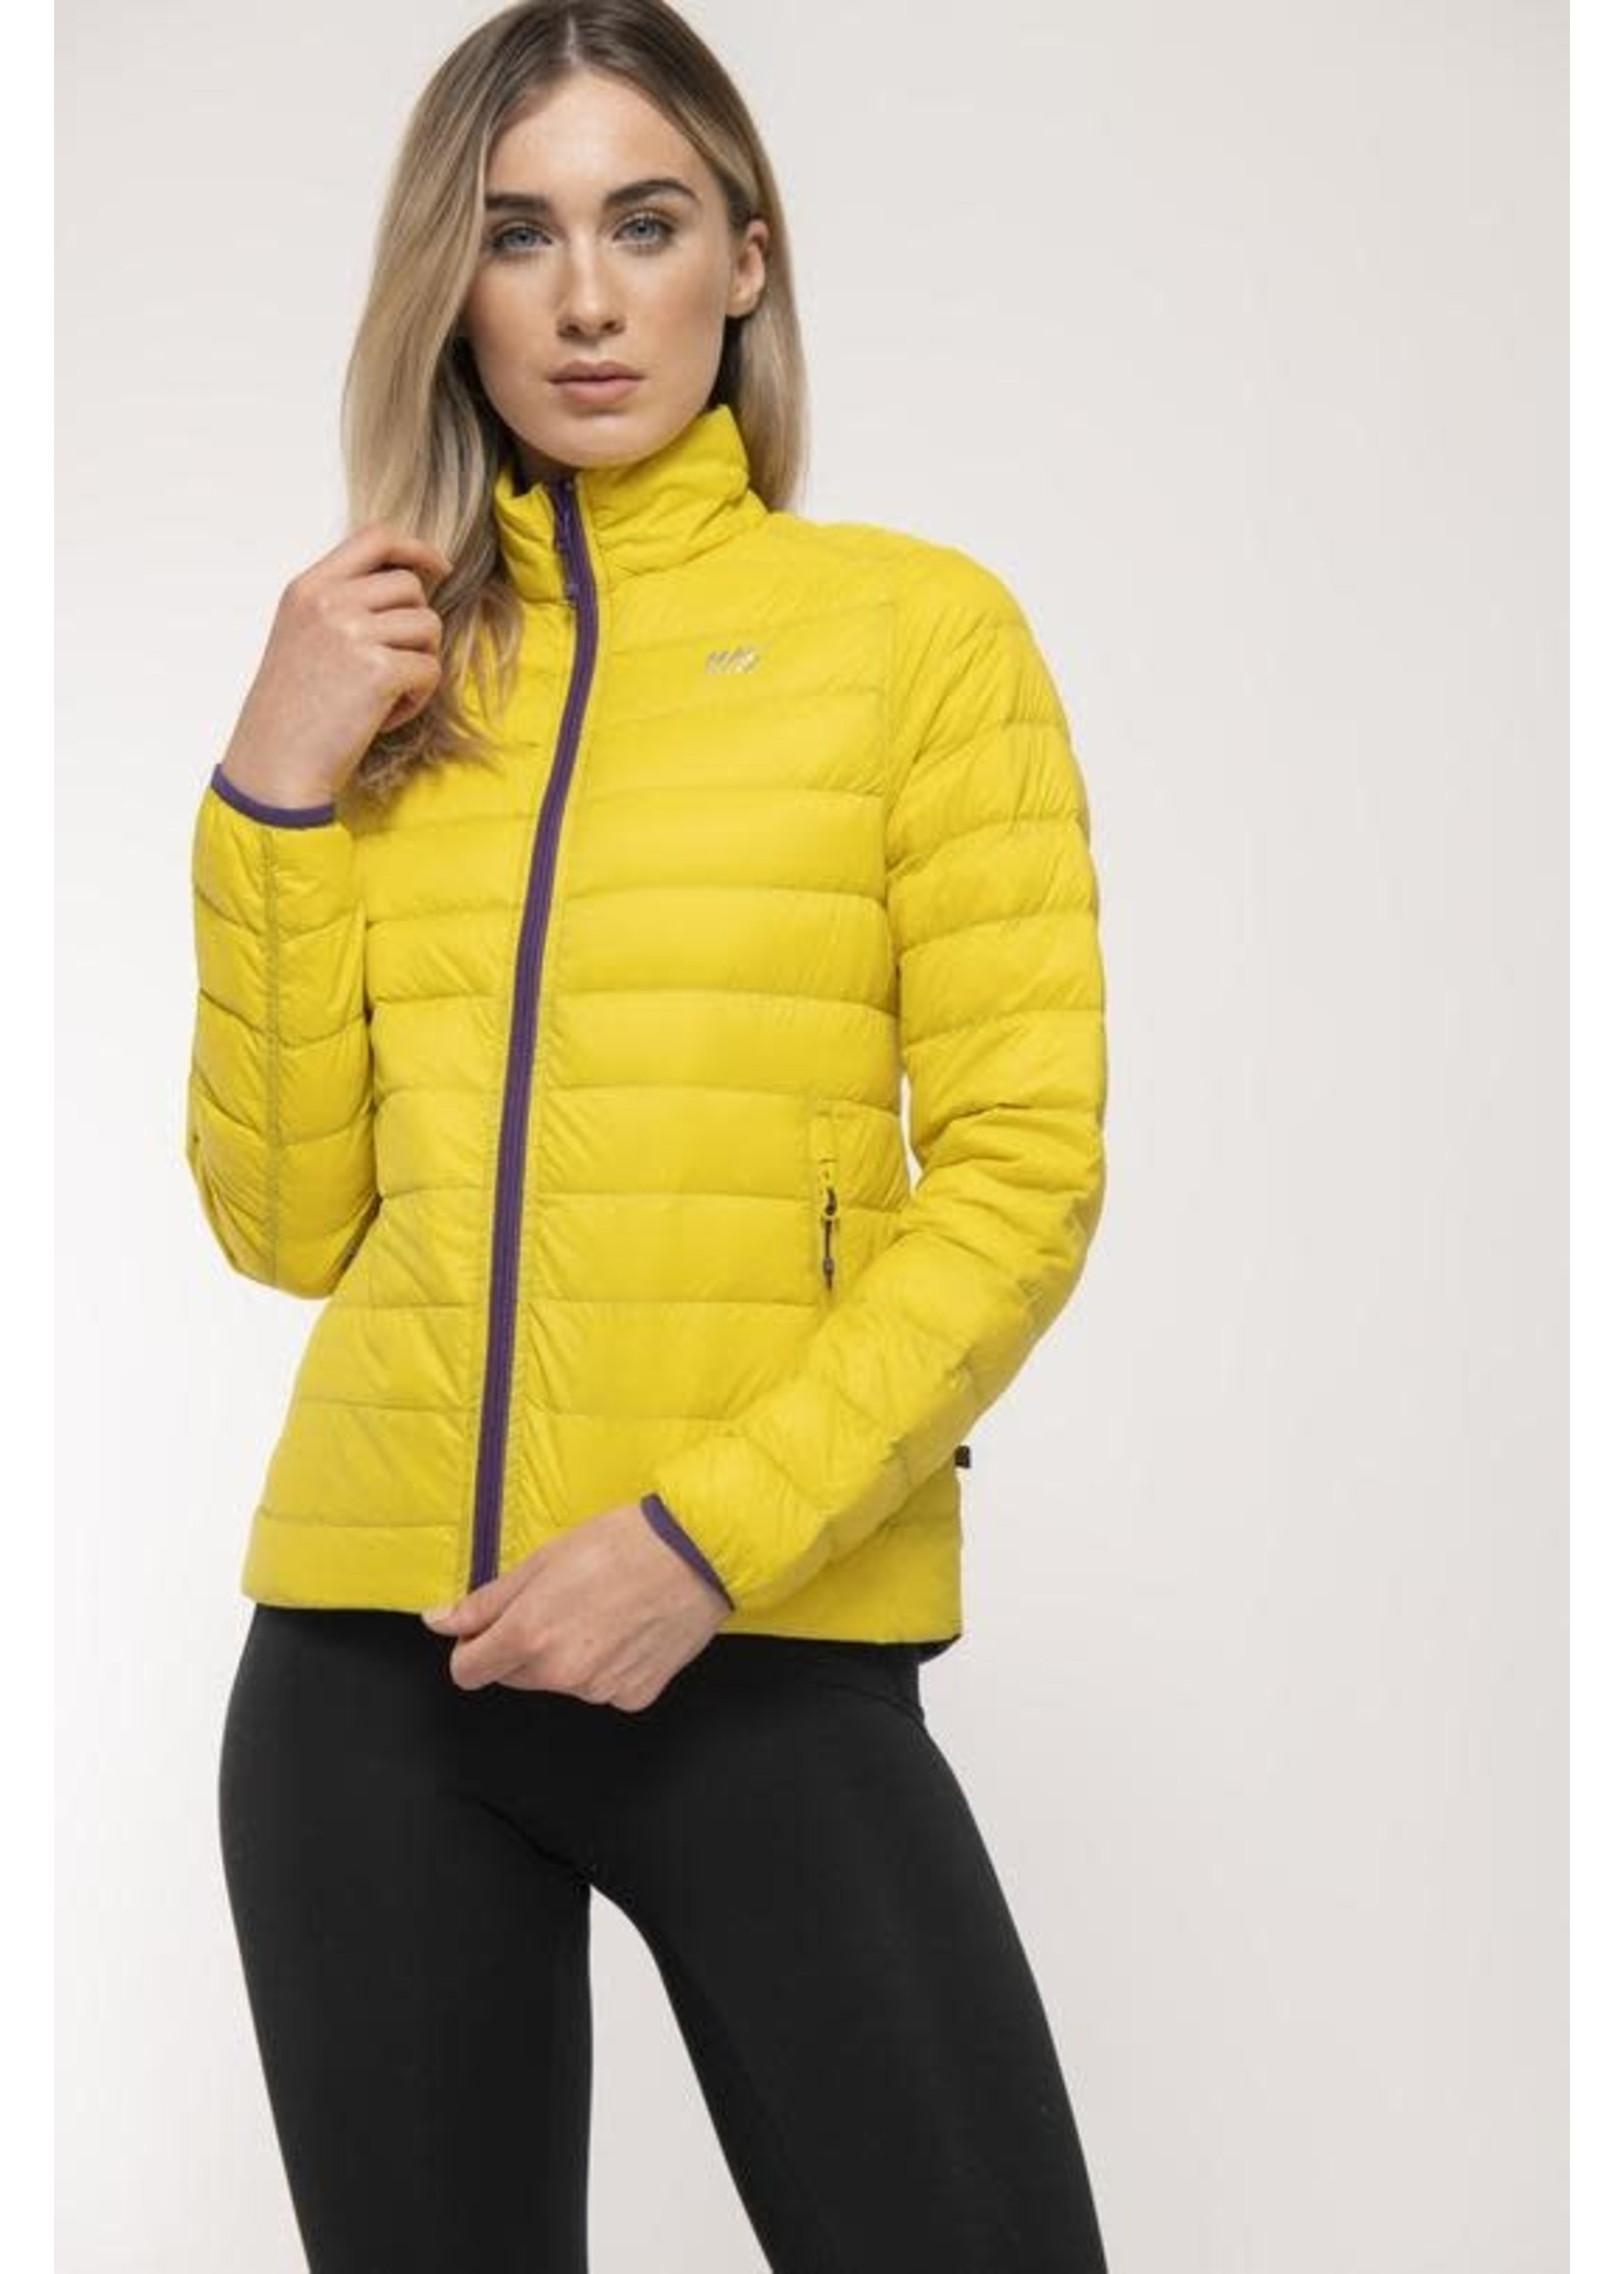 Mac In A Sac Mac in a Sac Polar Reversable Down Jacket - Ladies (2021)